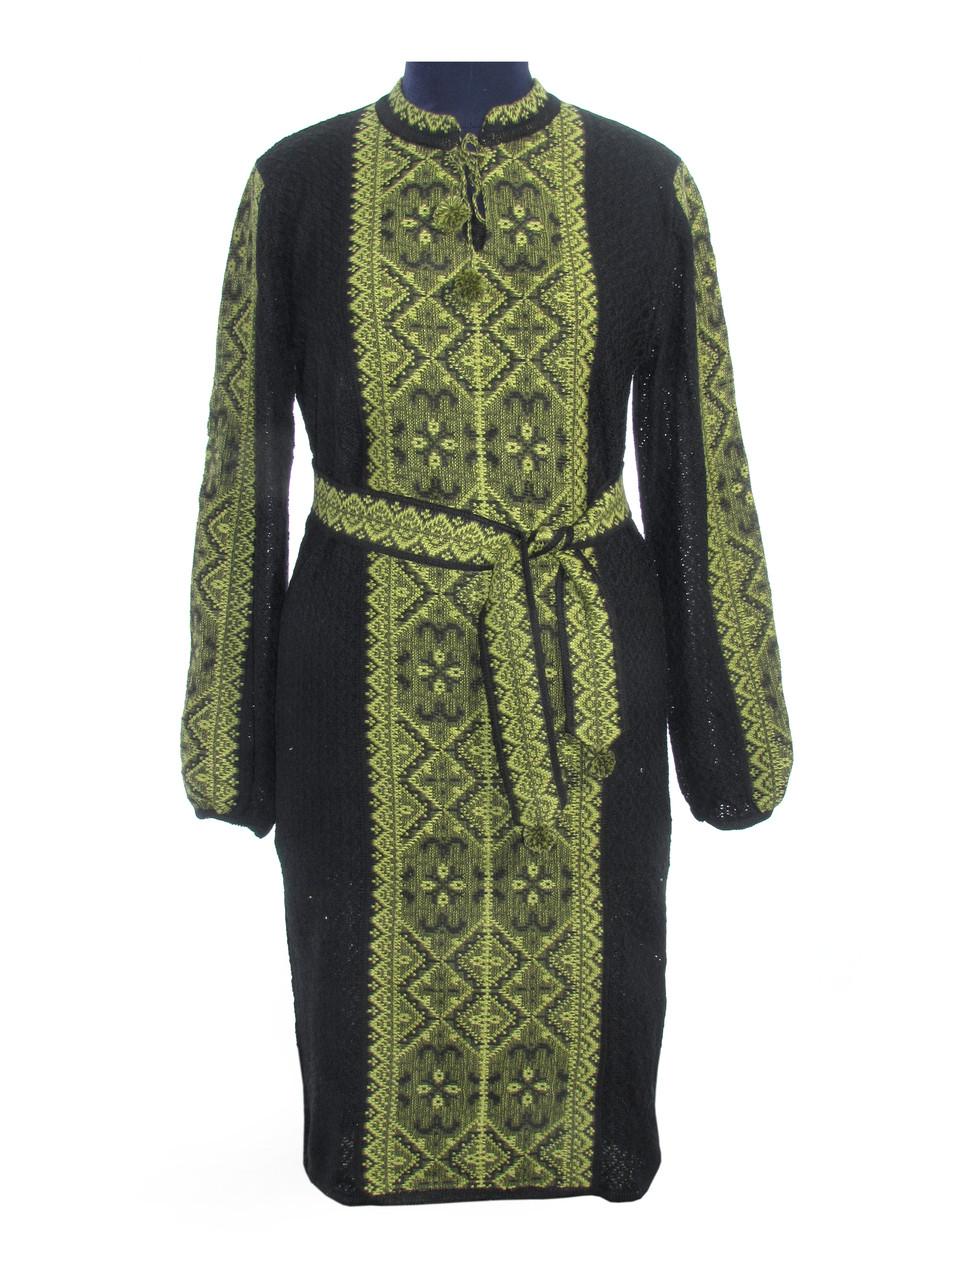 Вязаное платье Влада зеленая (черное х/б)